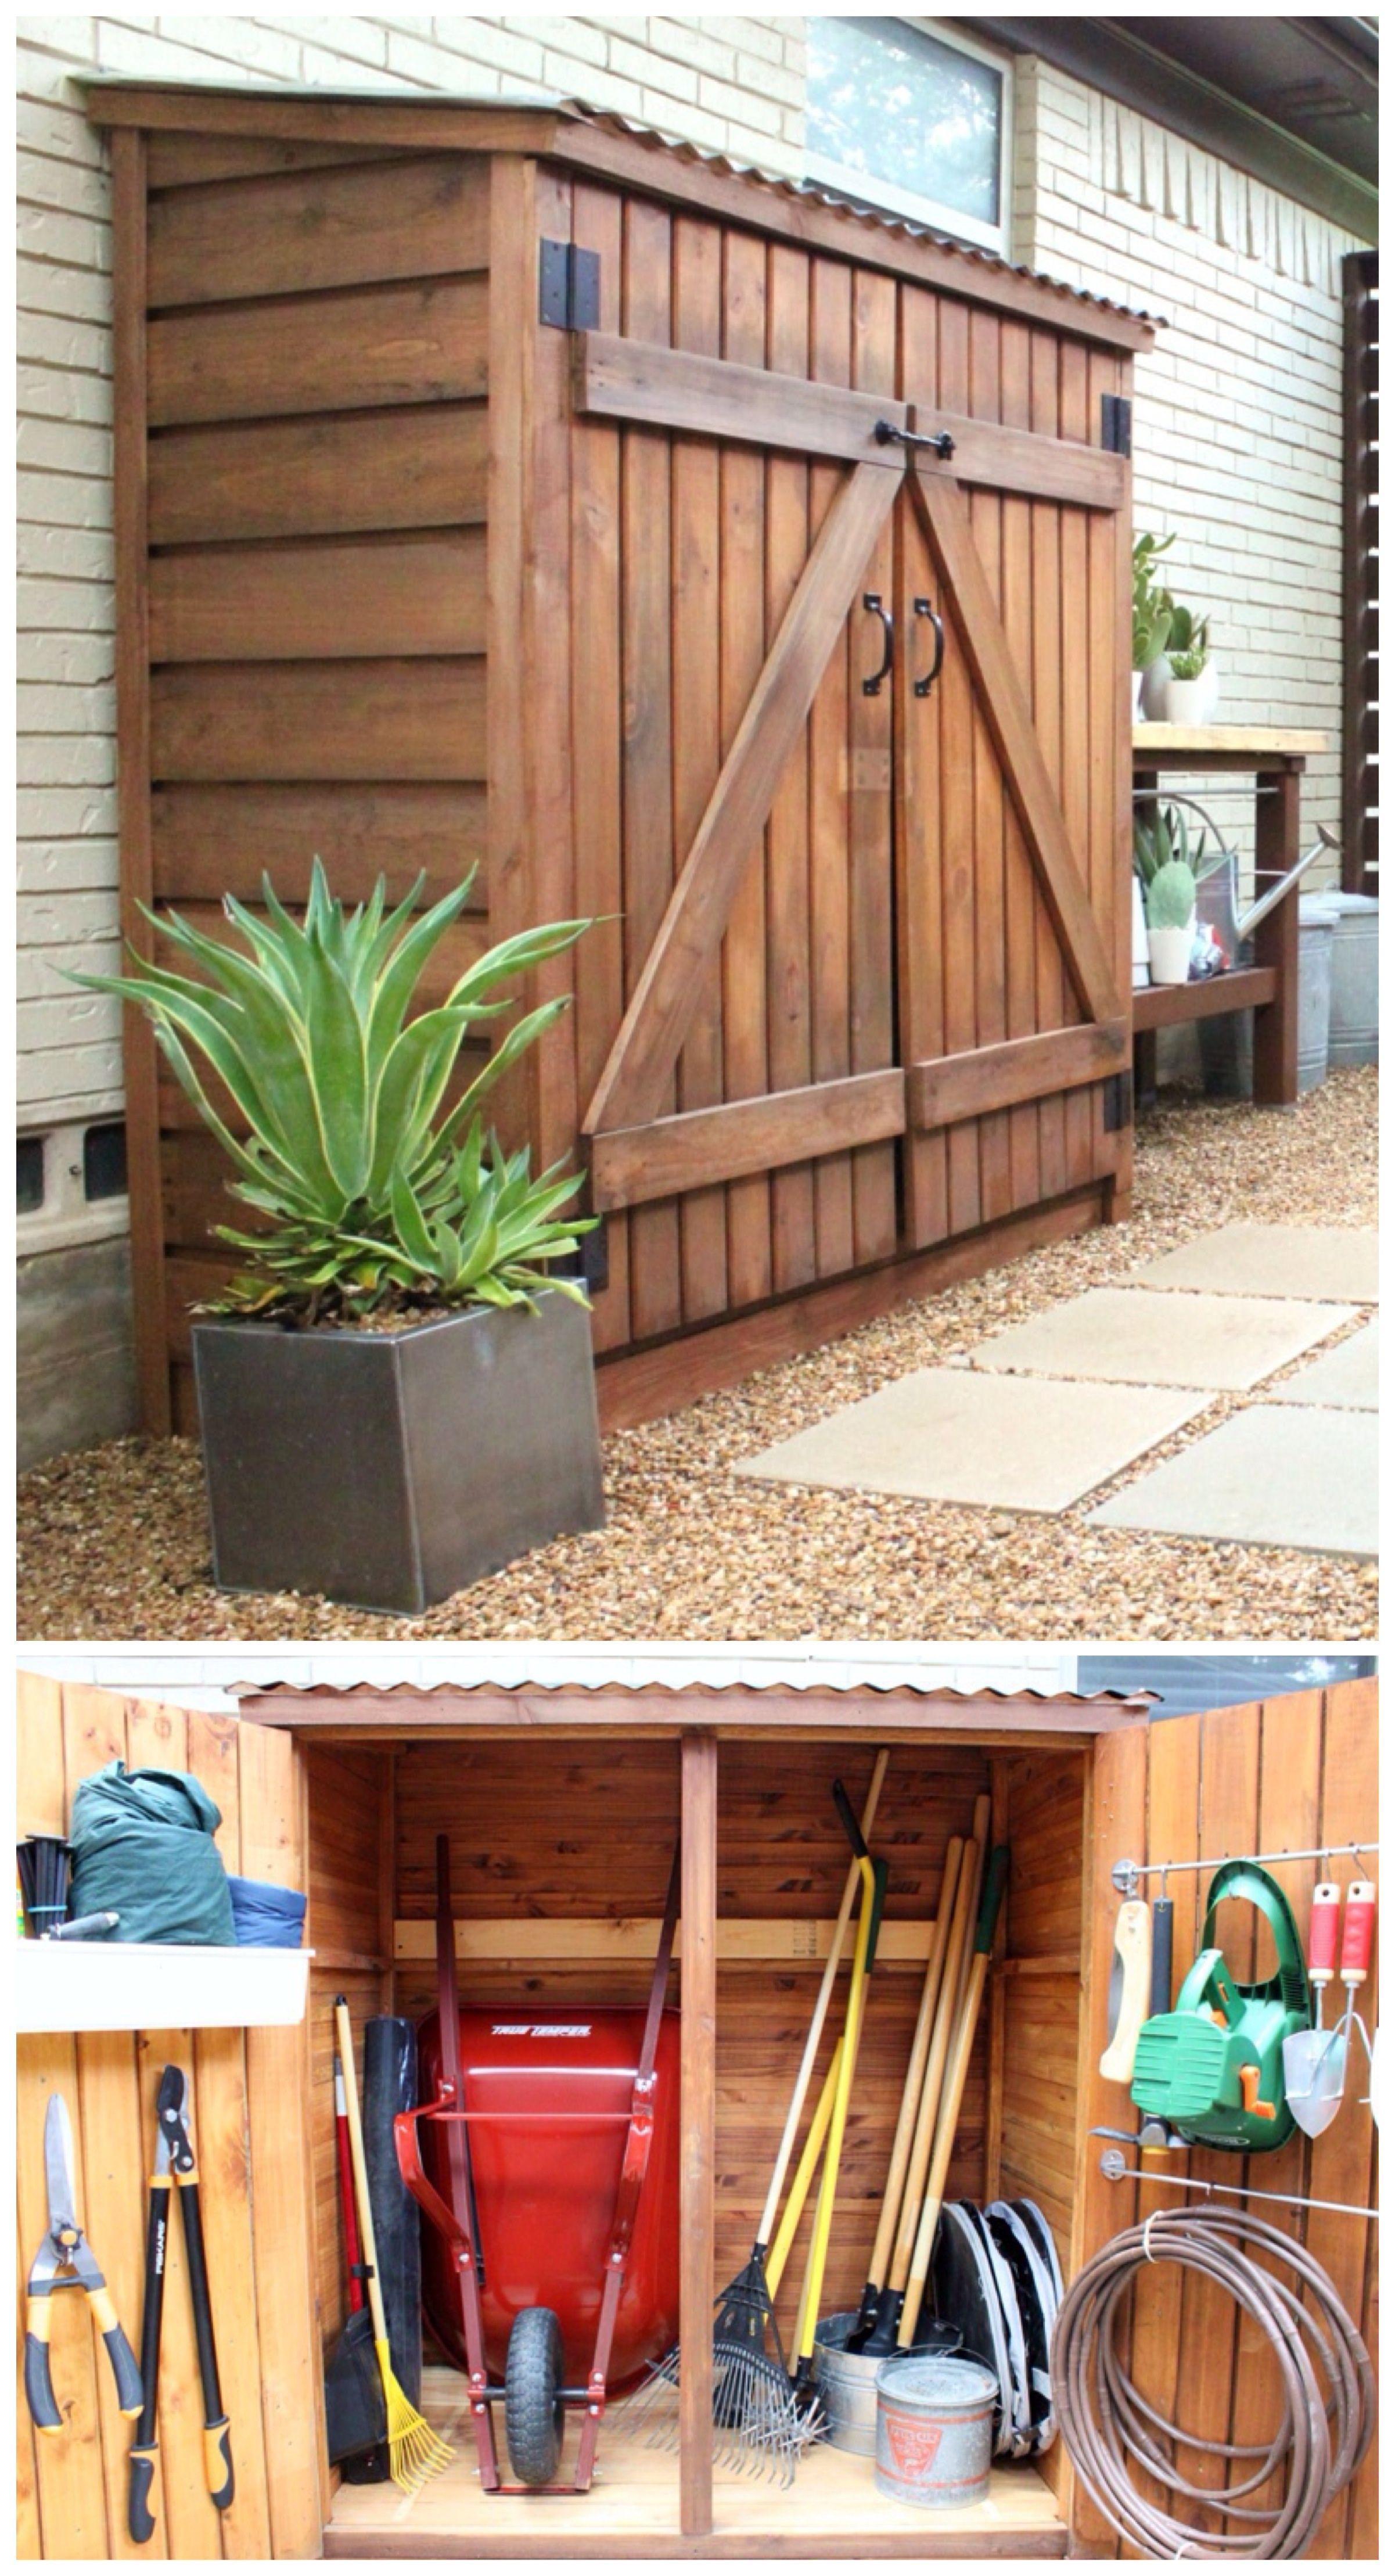 Tool Shed Updates | Rangement Jardin, Outils De Jardin Et ... intérieur Abri De Jardin Original